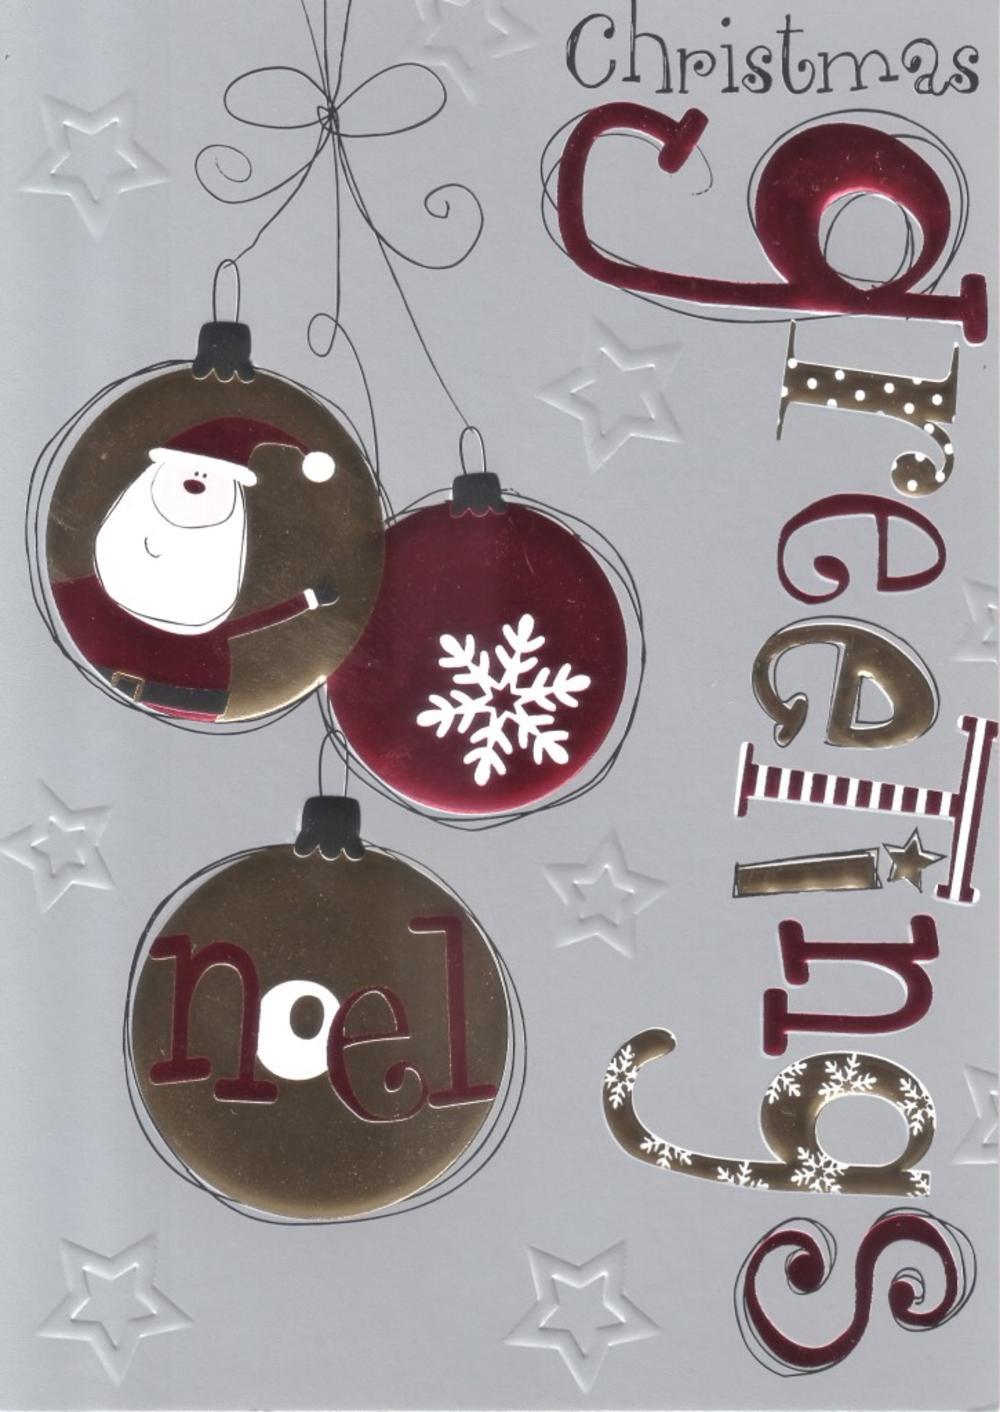 Individual Christmas Greetings Card